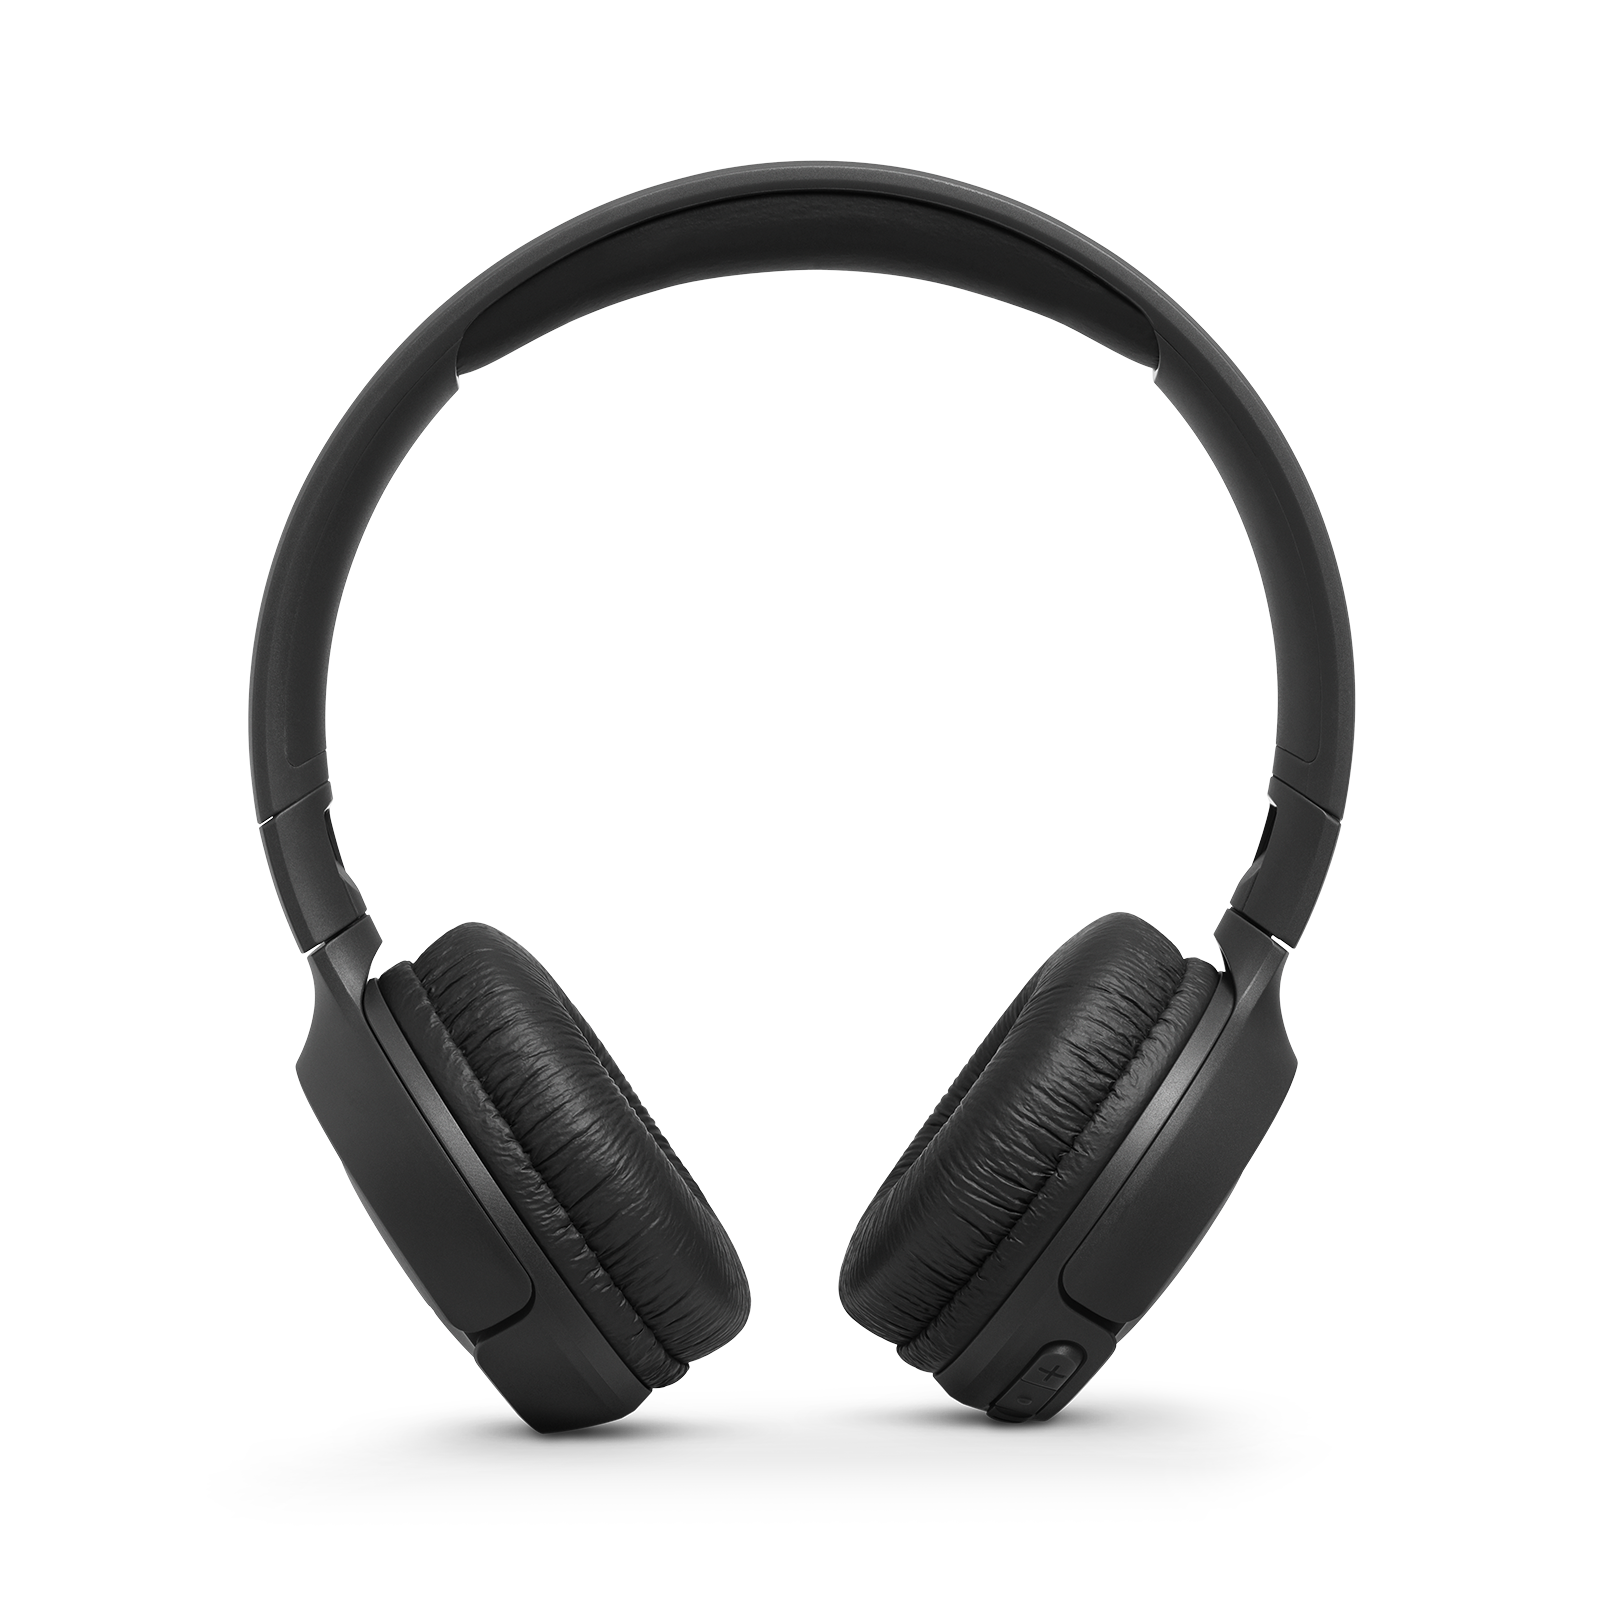 Jbl Tune 500bt Wireless On Ear Headphones Headset Bluetooth X Under Armour Earphone Headphone Handsfree